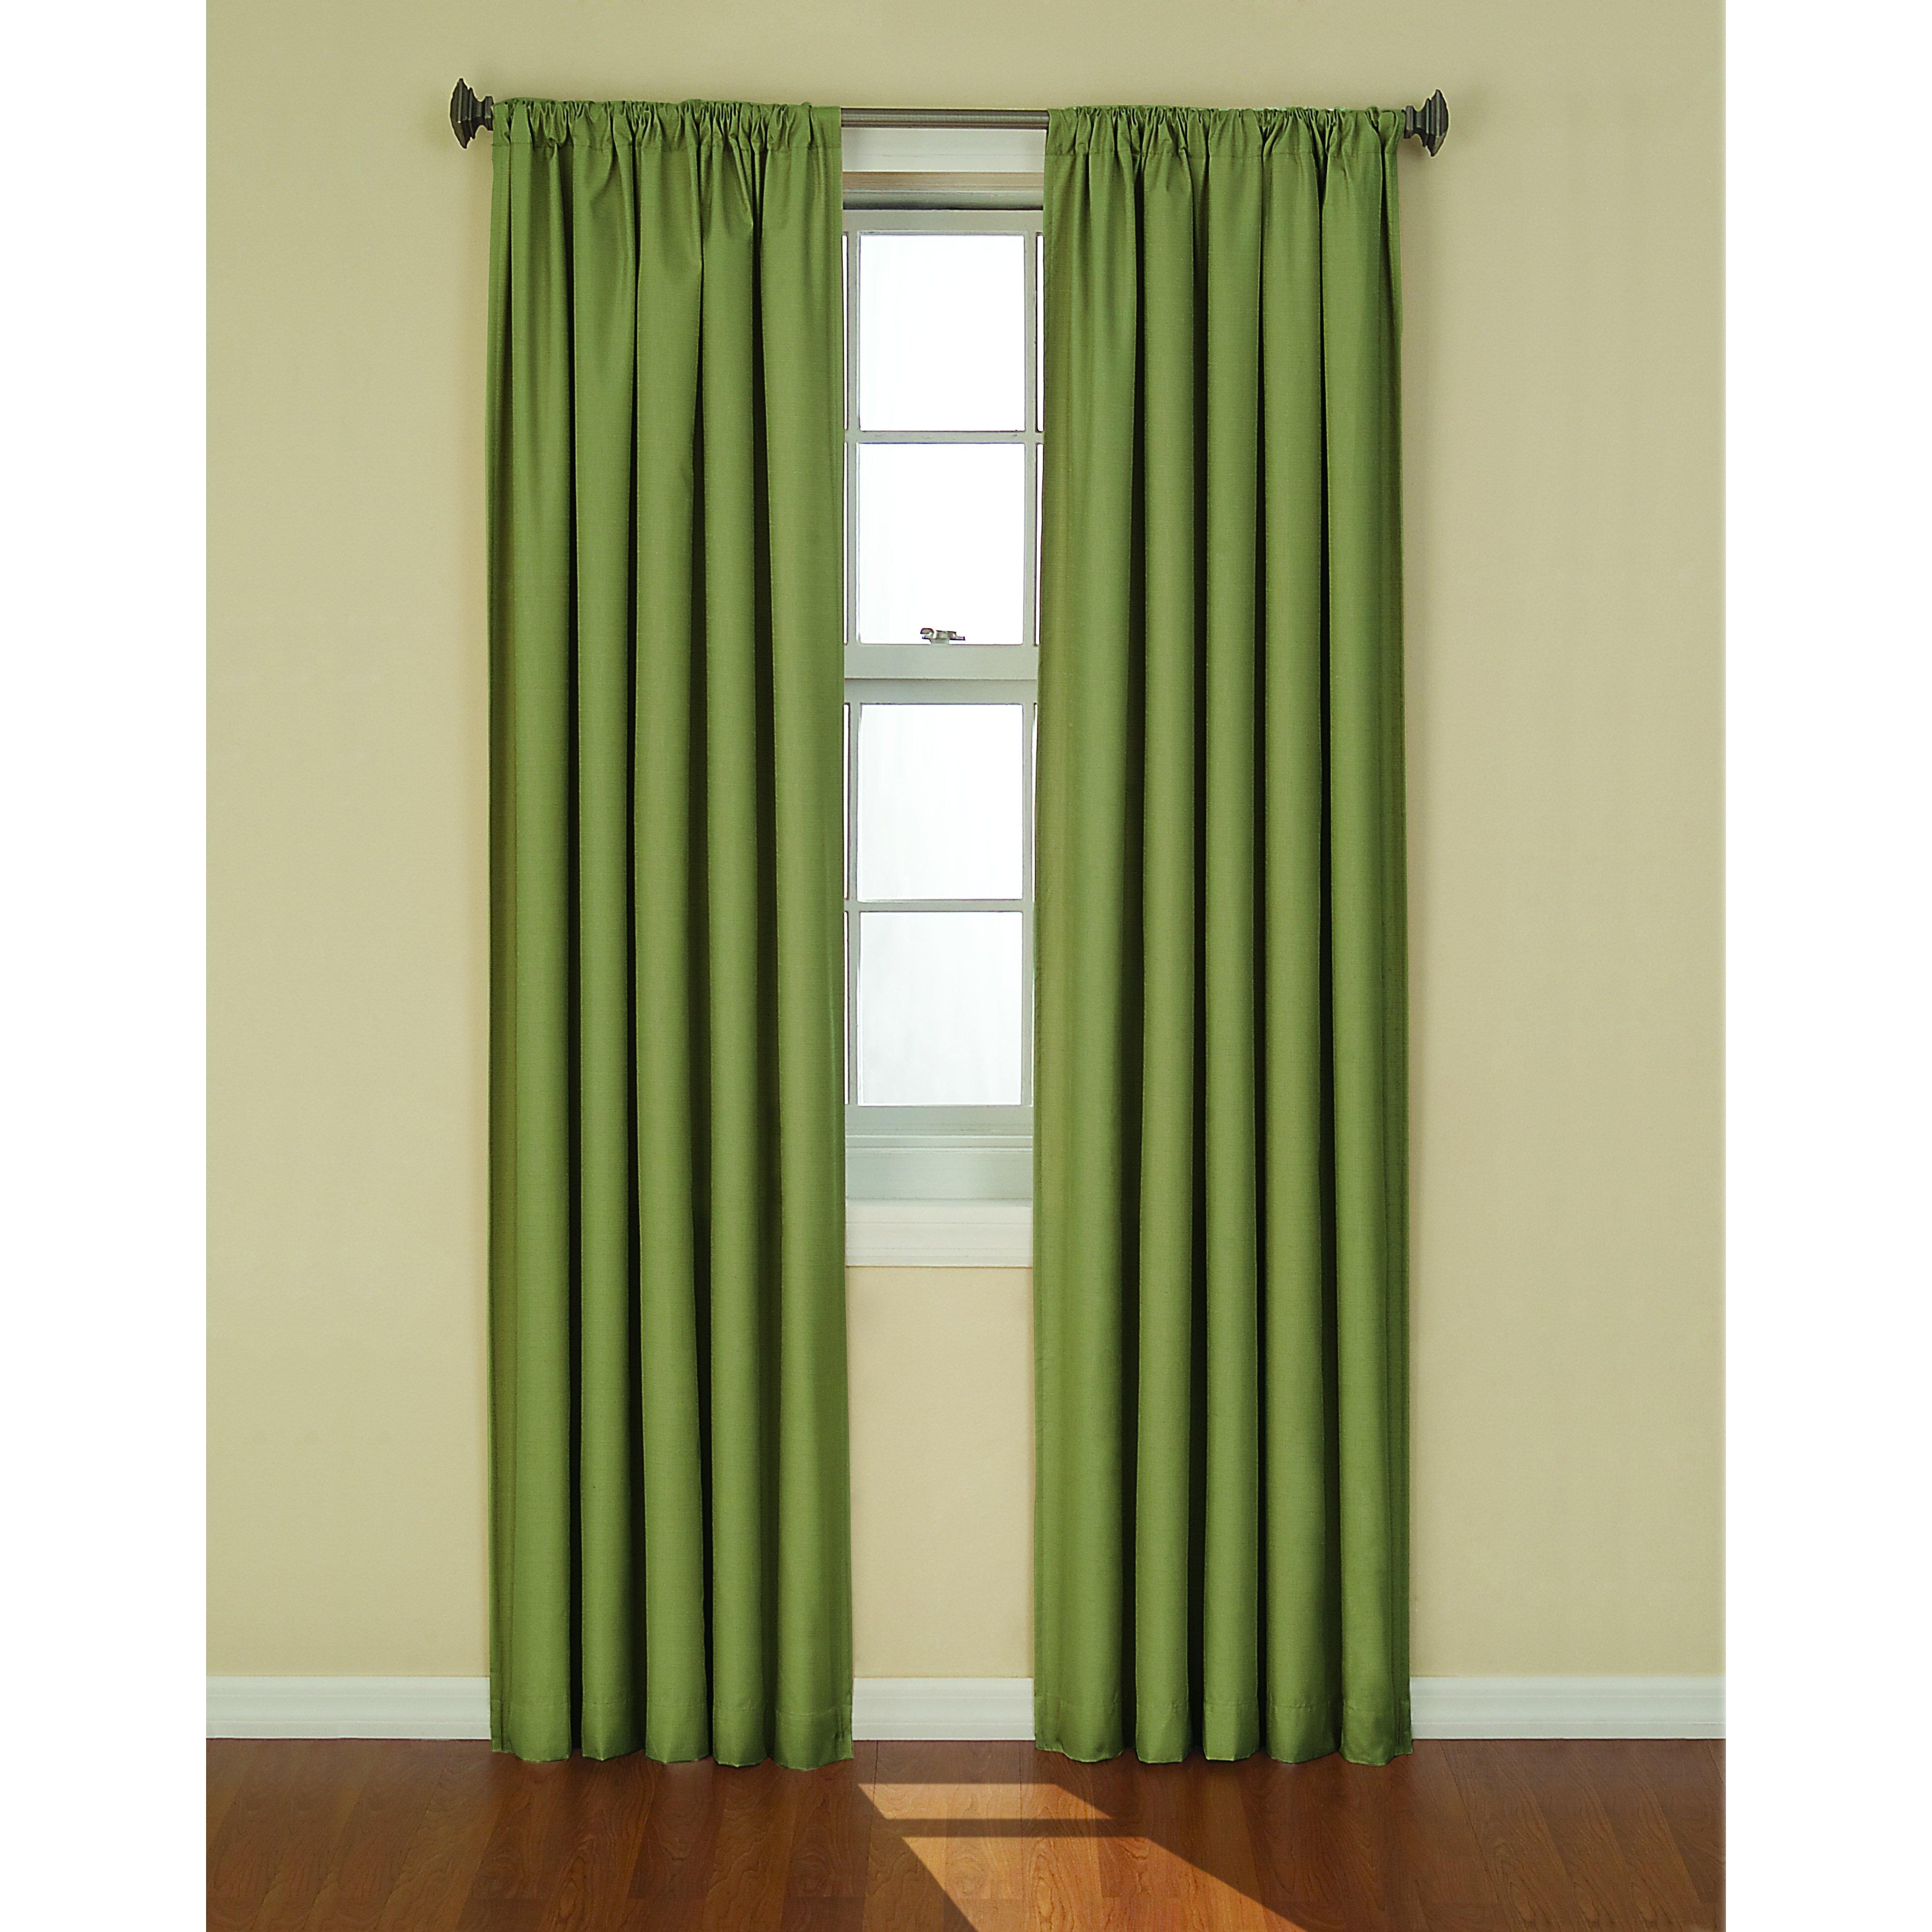 Charlton Home Columbia Rod Pocket Single Blackout Curtain